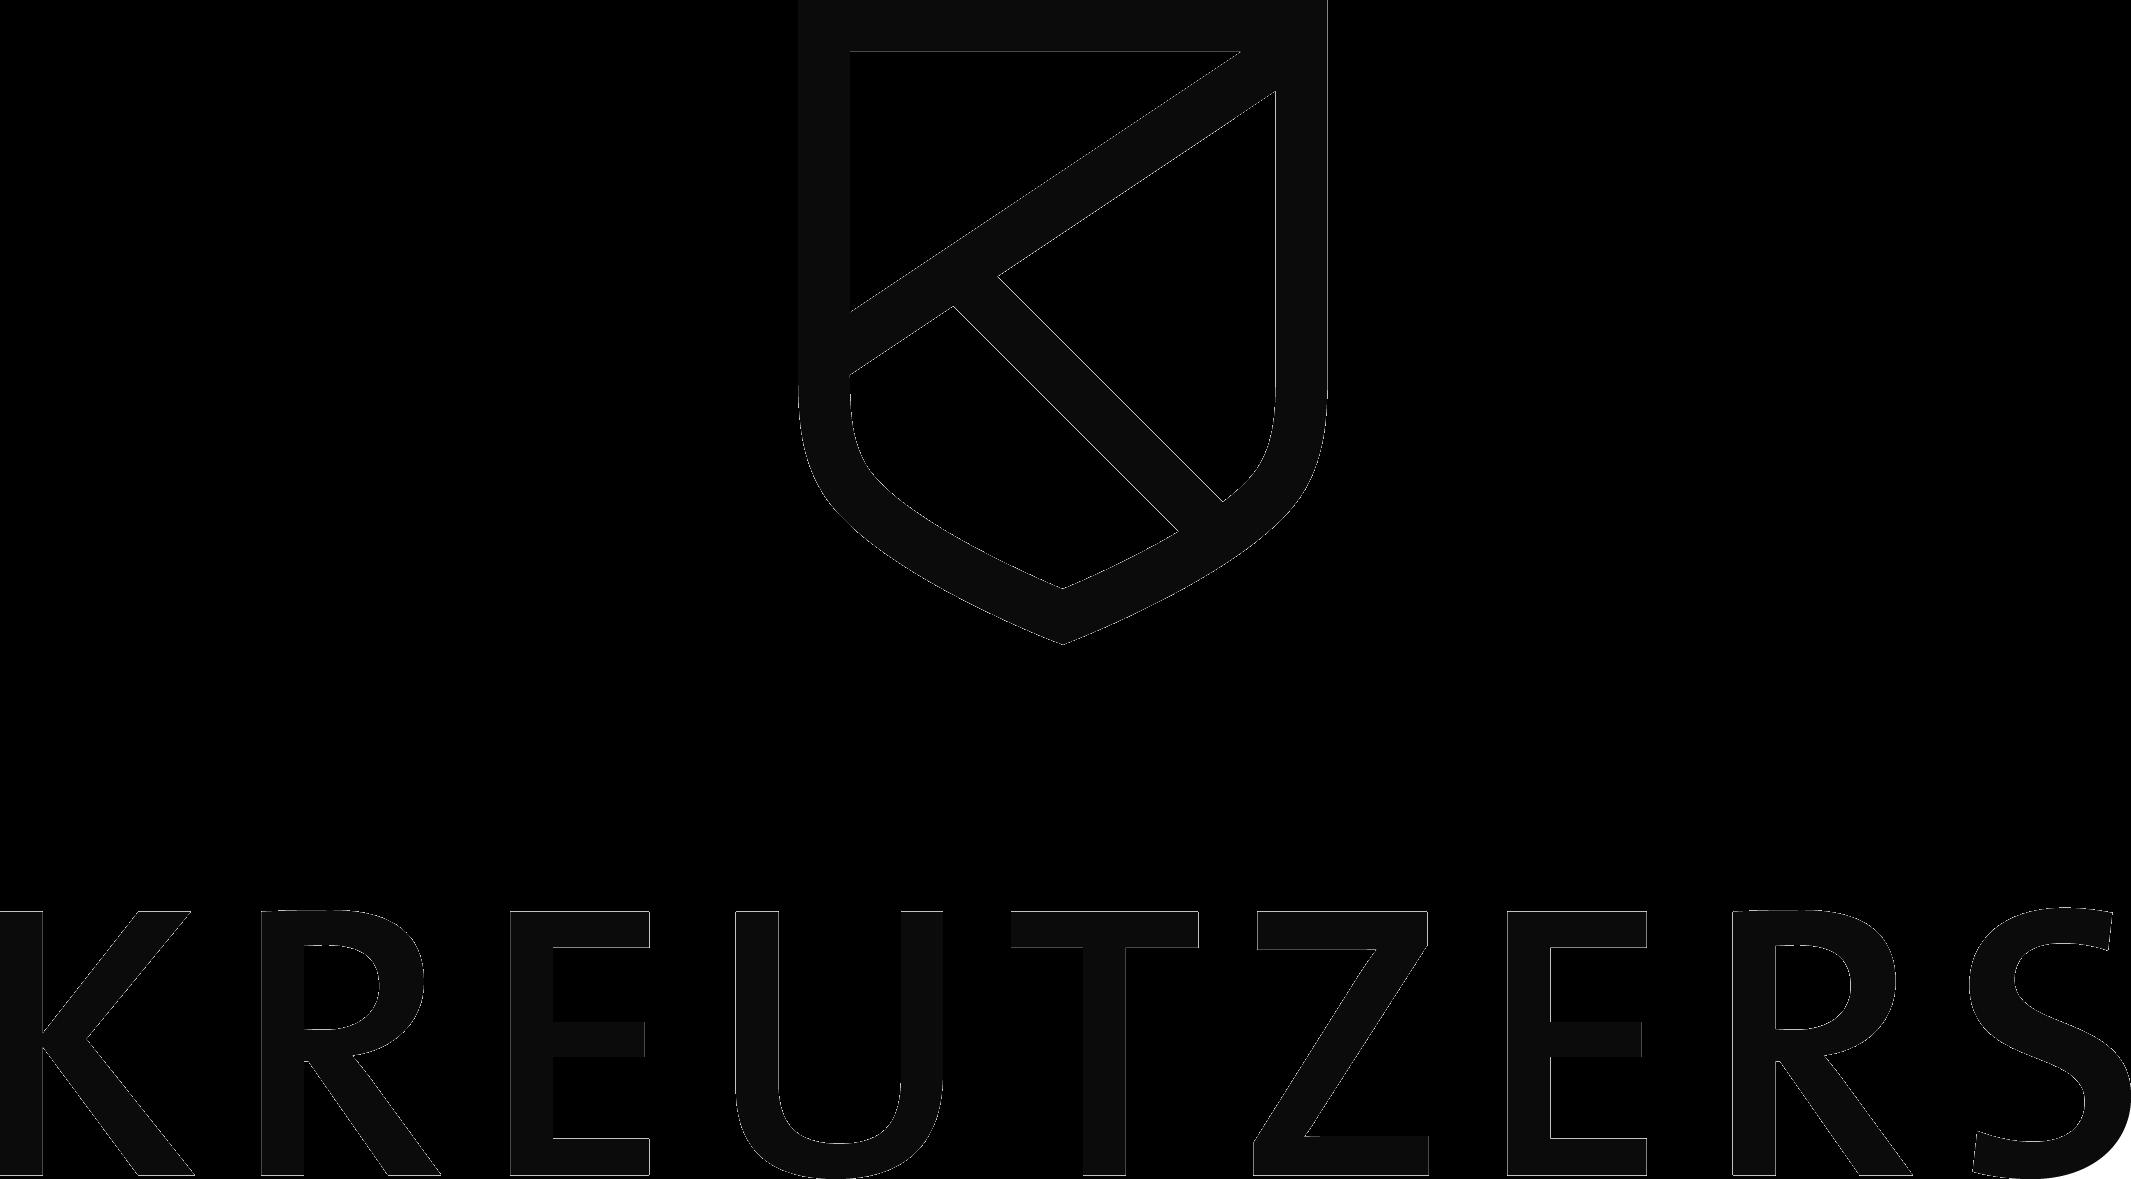 Edition Kreutzers